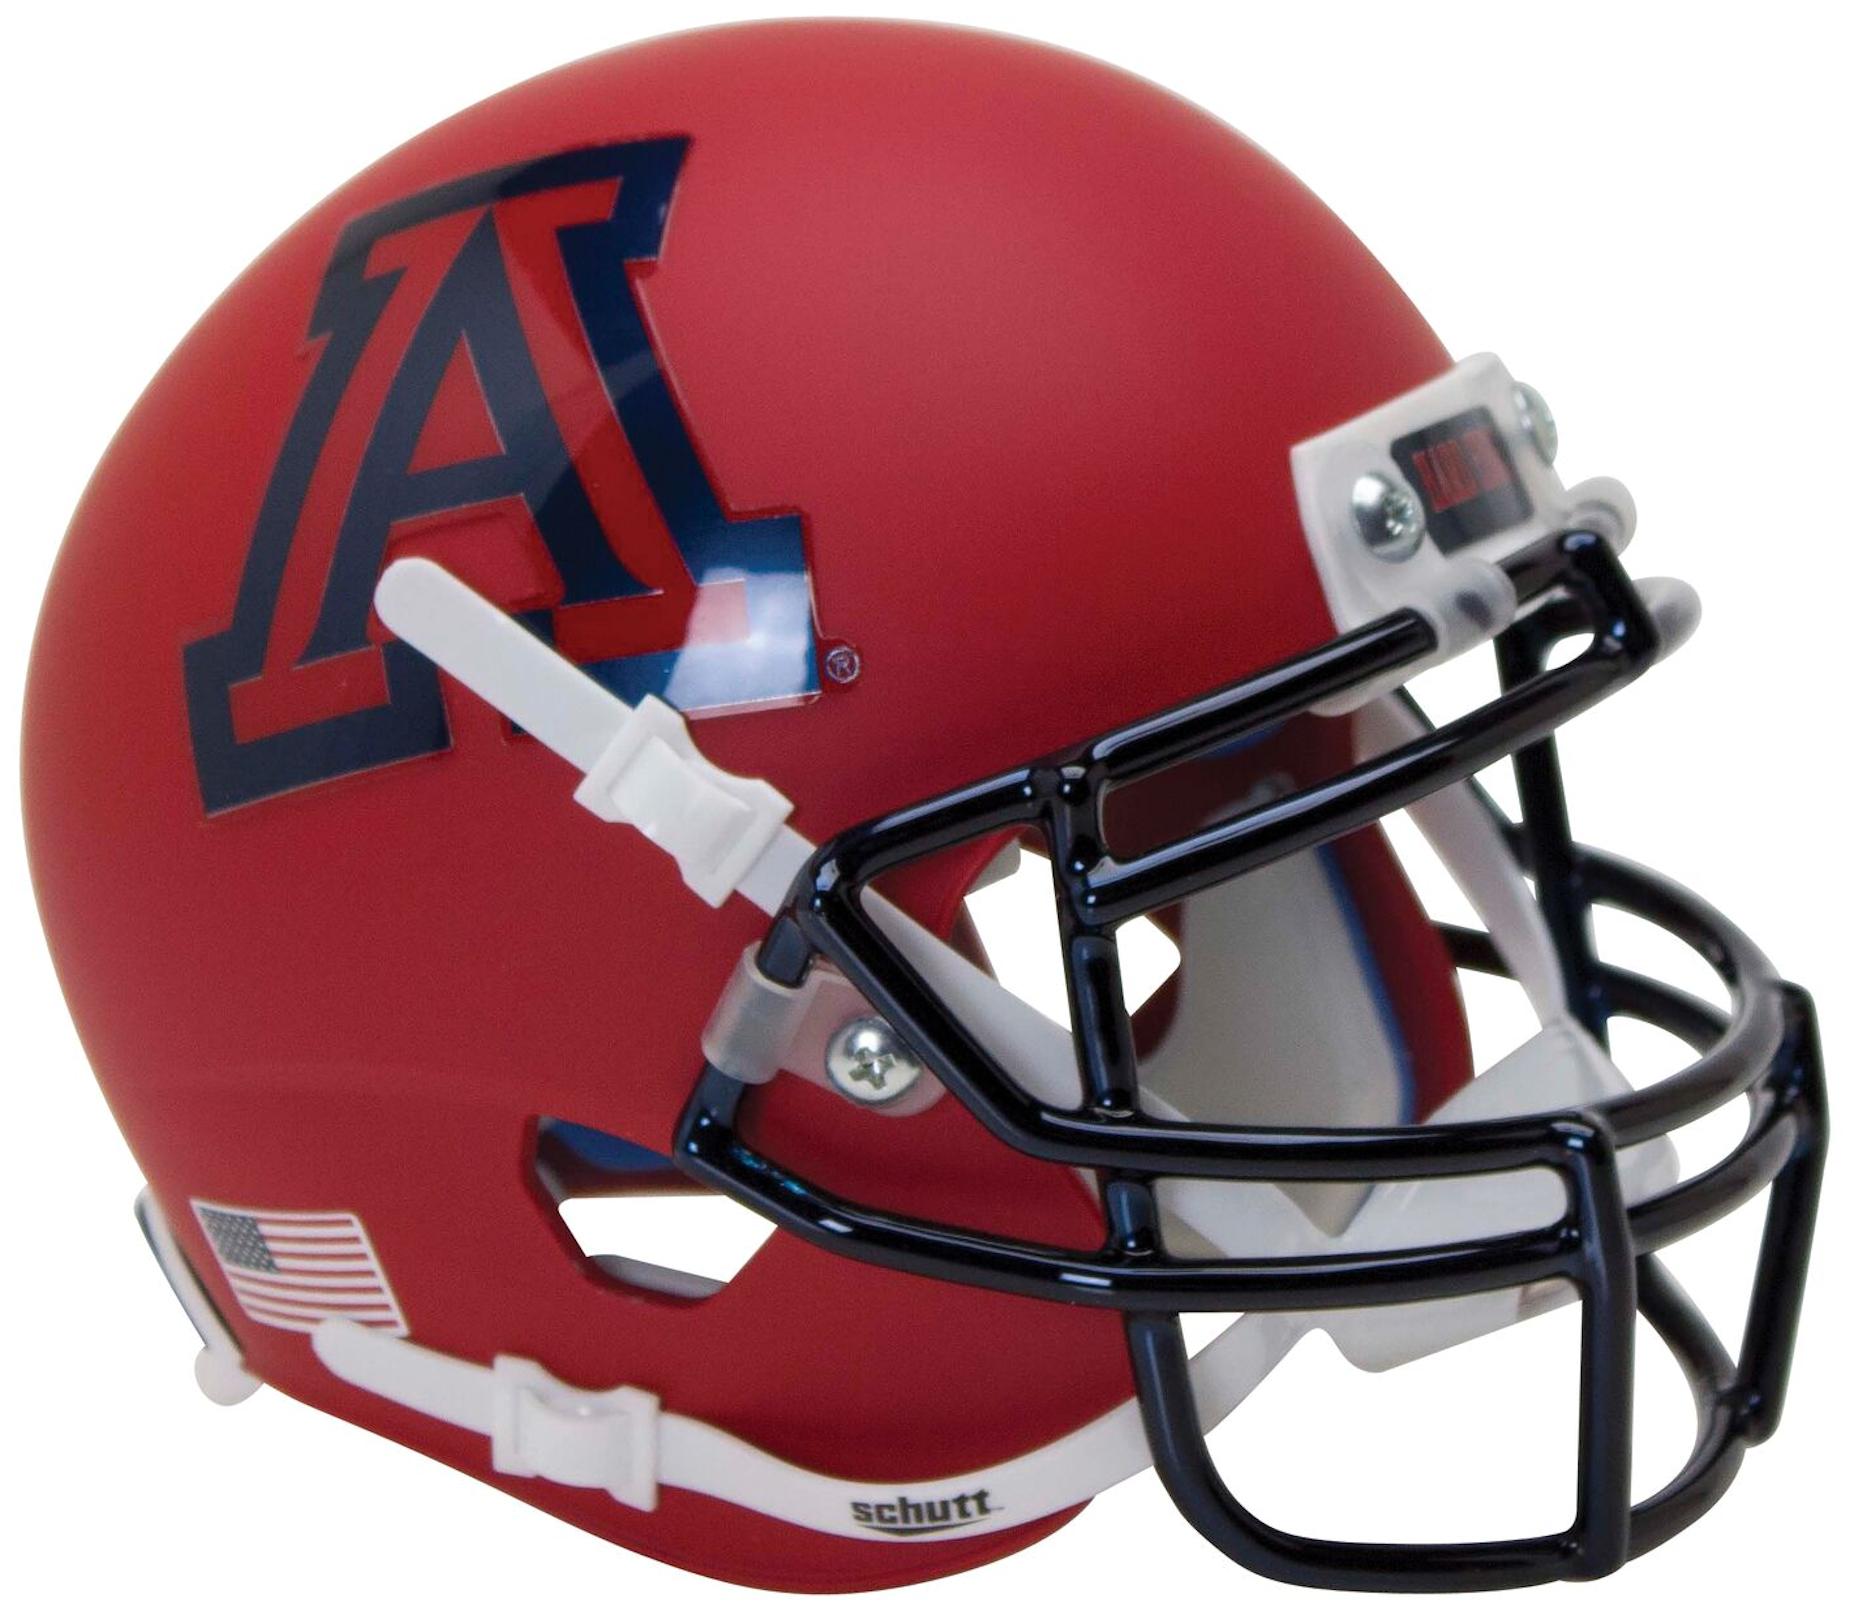 Arizona Wildcats Authentic College XP Football Helmet Schutt <B>Matte Scarlet</B>